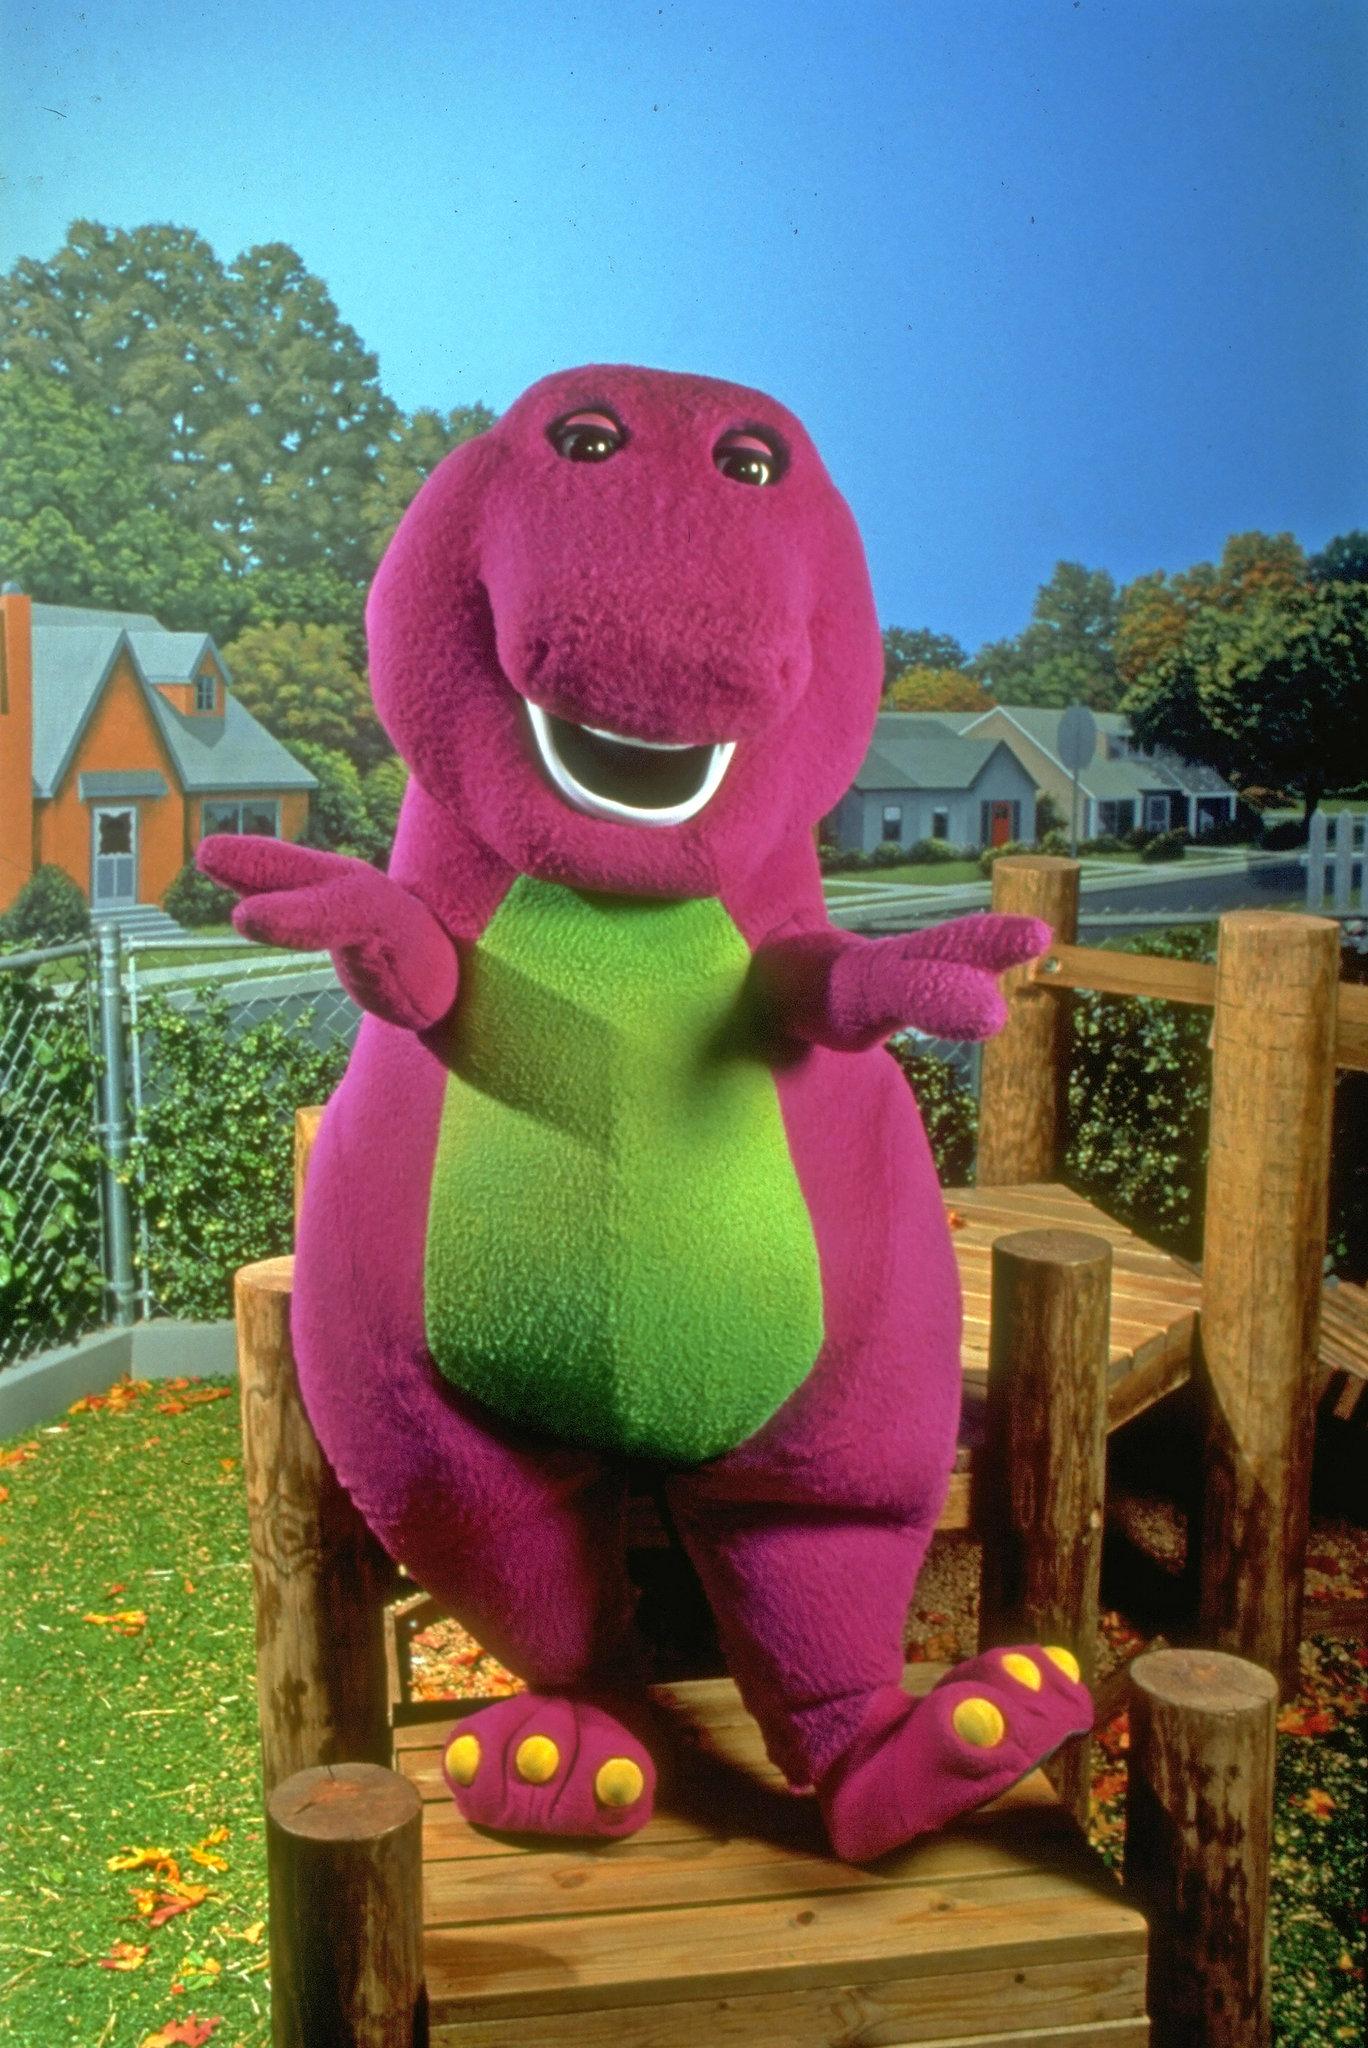 Barney & Friends If The Shoe Fits : barney, friends, Blame, 'Barney'?, Little, Guilty, Times